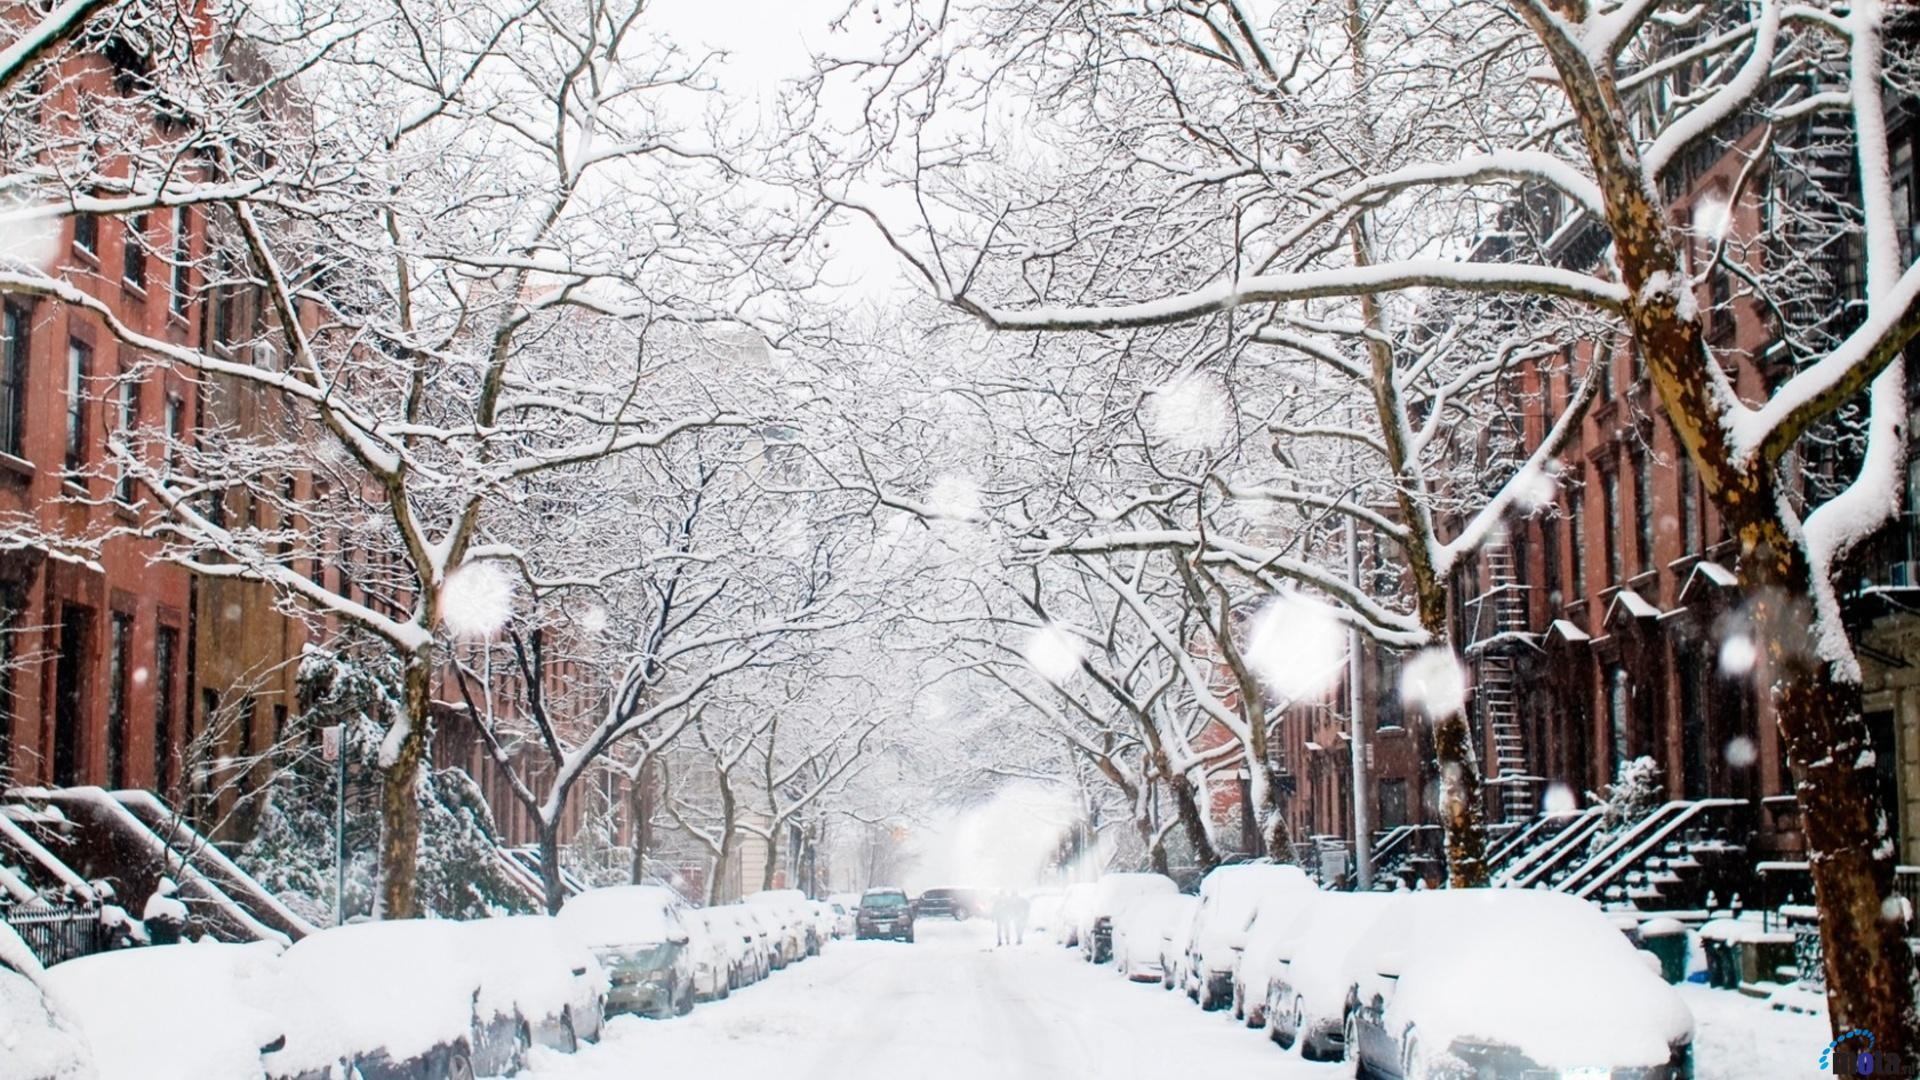 Winter City Wallpapers Phone As Wallpaper HD